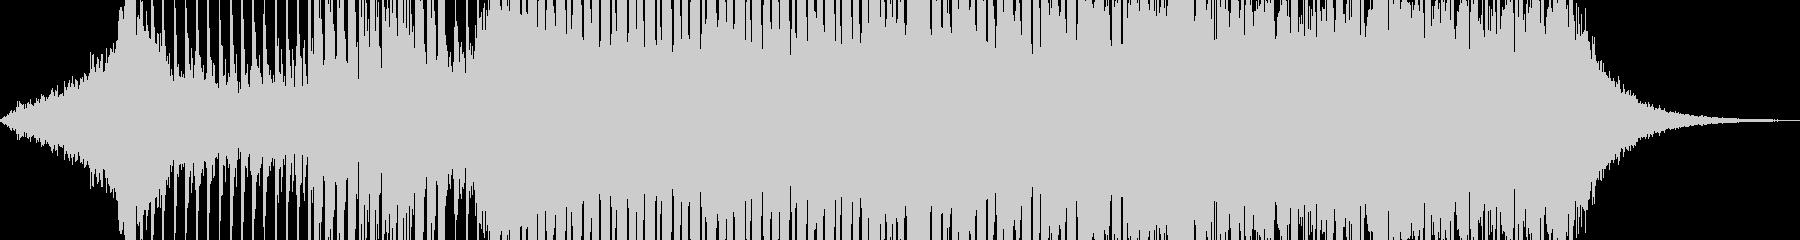 EDM風・90テクノBGM_BGM005の未再生の波形